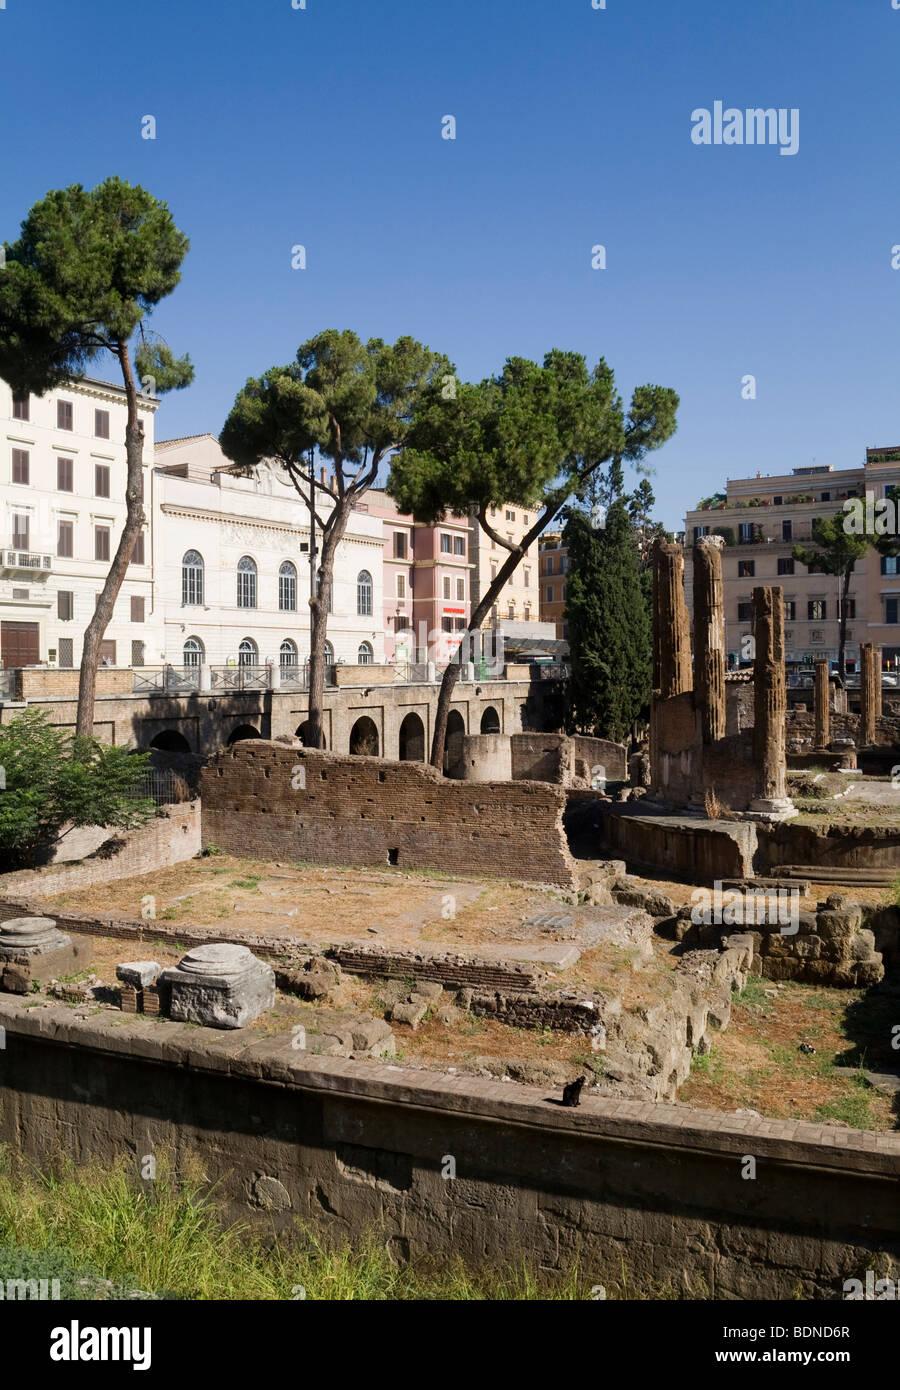 Area Sacra di Largo Argentina, Rome, Lazio, Italy, Europe Stock Photo